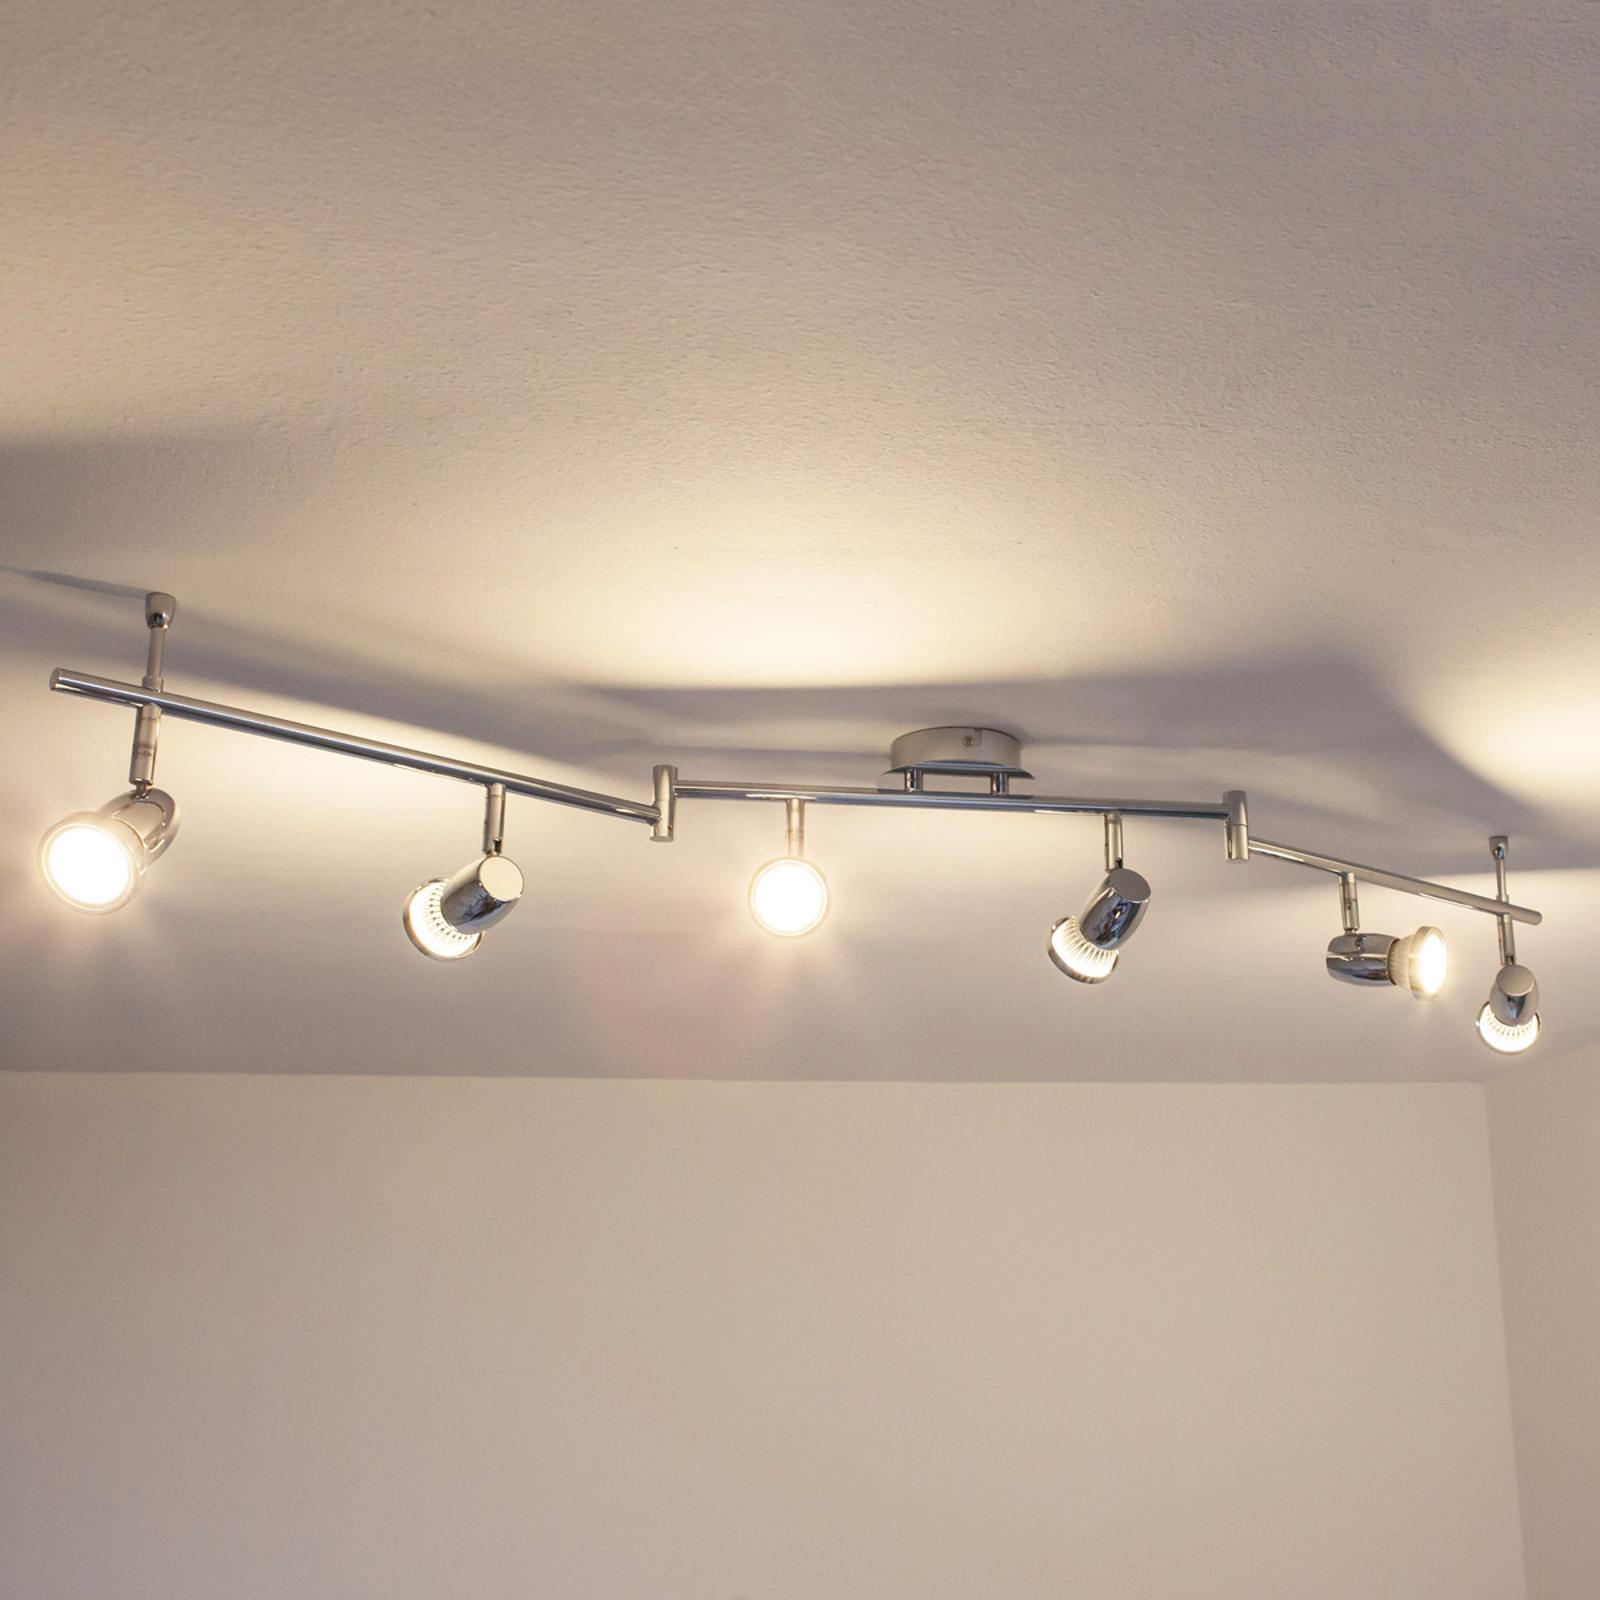 Sekspunkts LED-krom taklampe Arminius